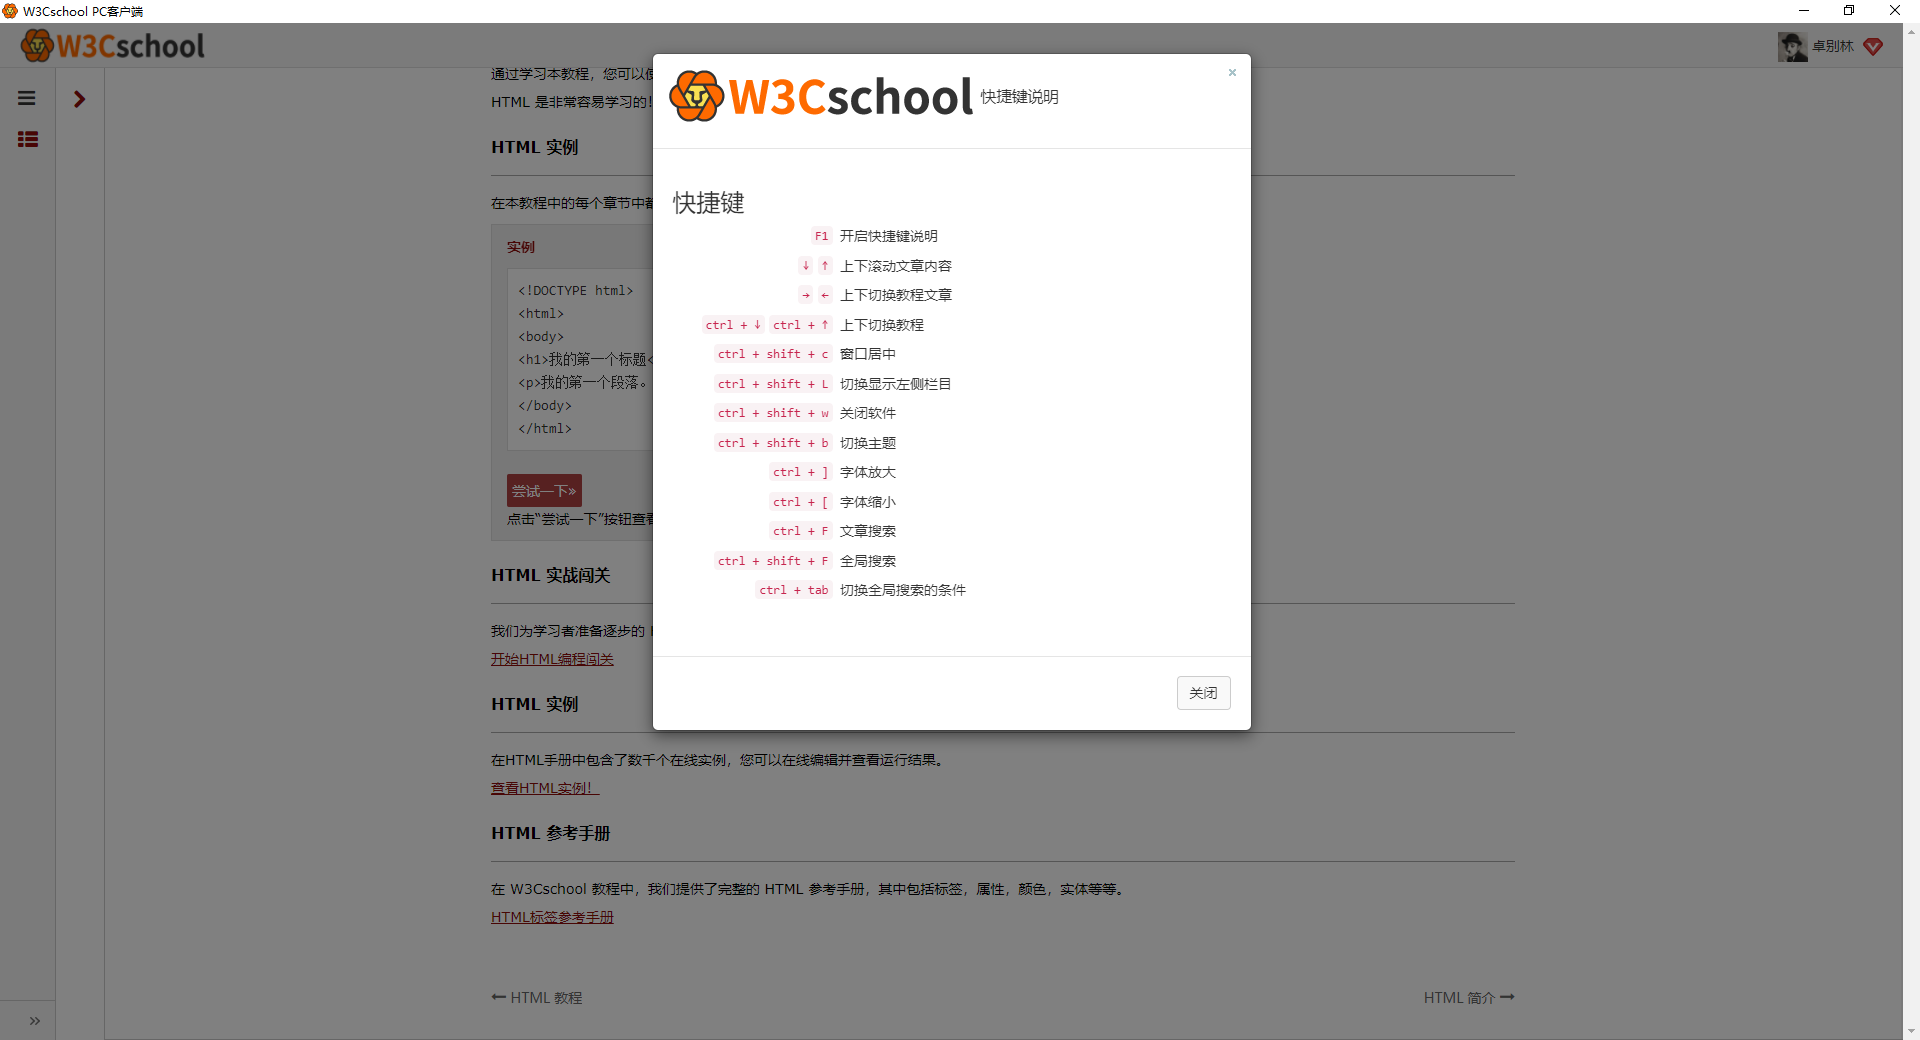 w3cschool客户端快捷键